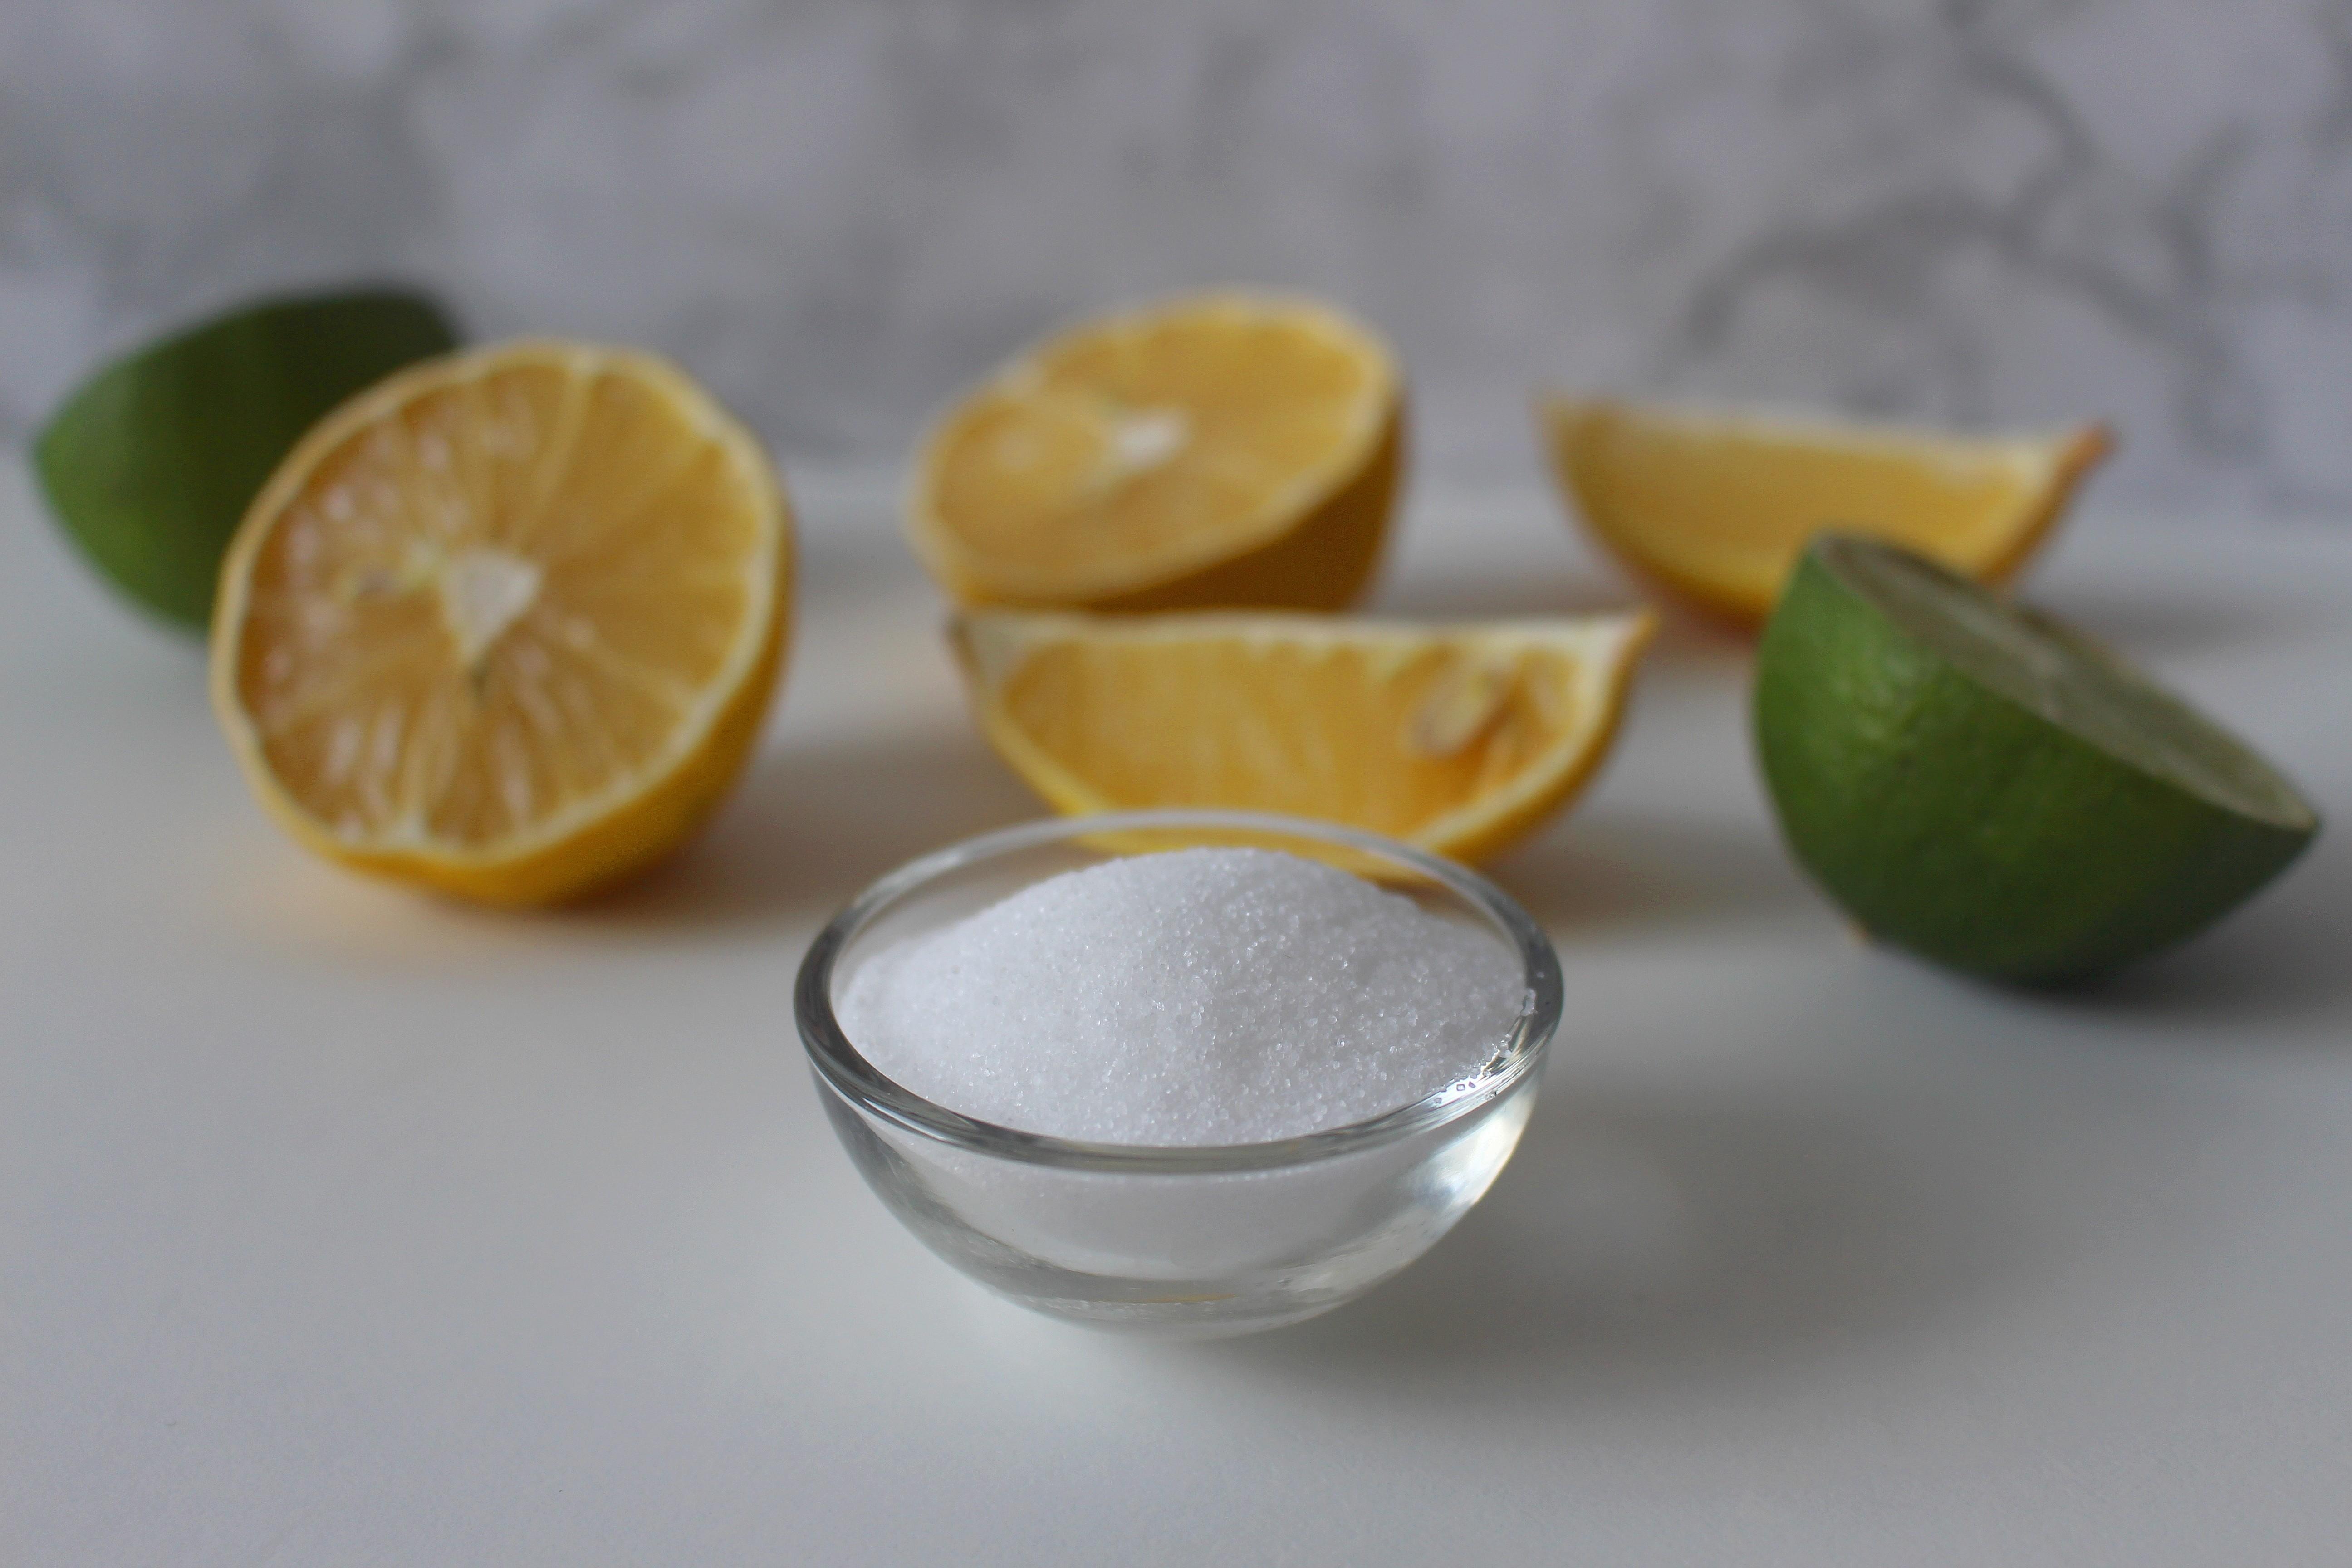 Лимонная кислота вредна для кожи и желудка